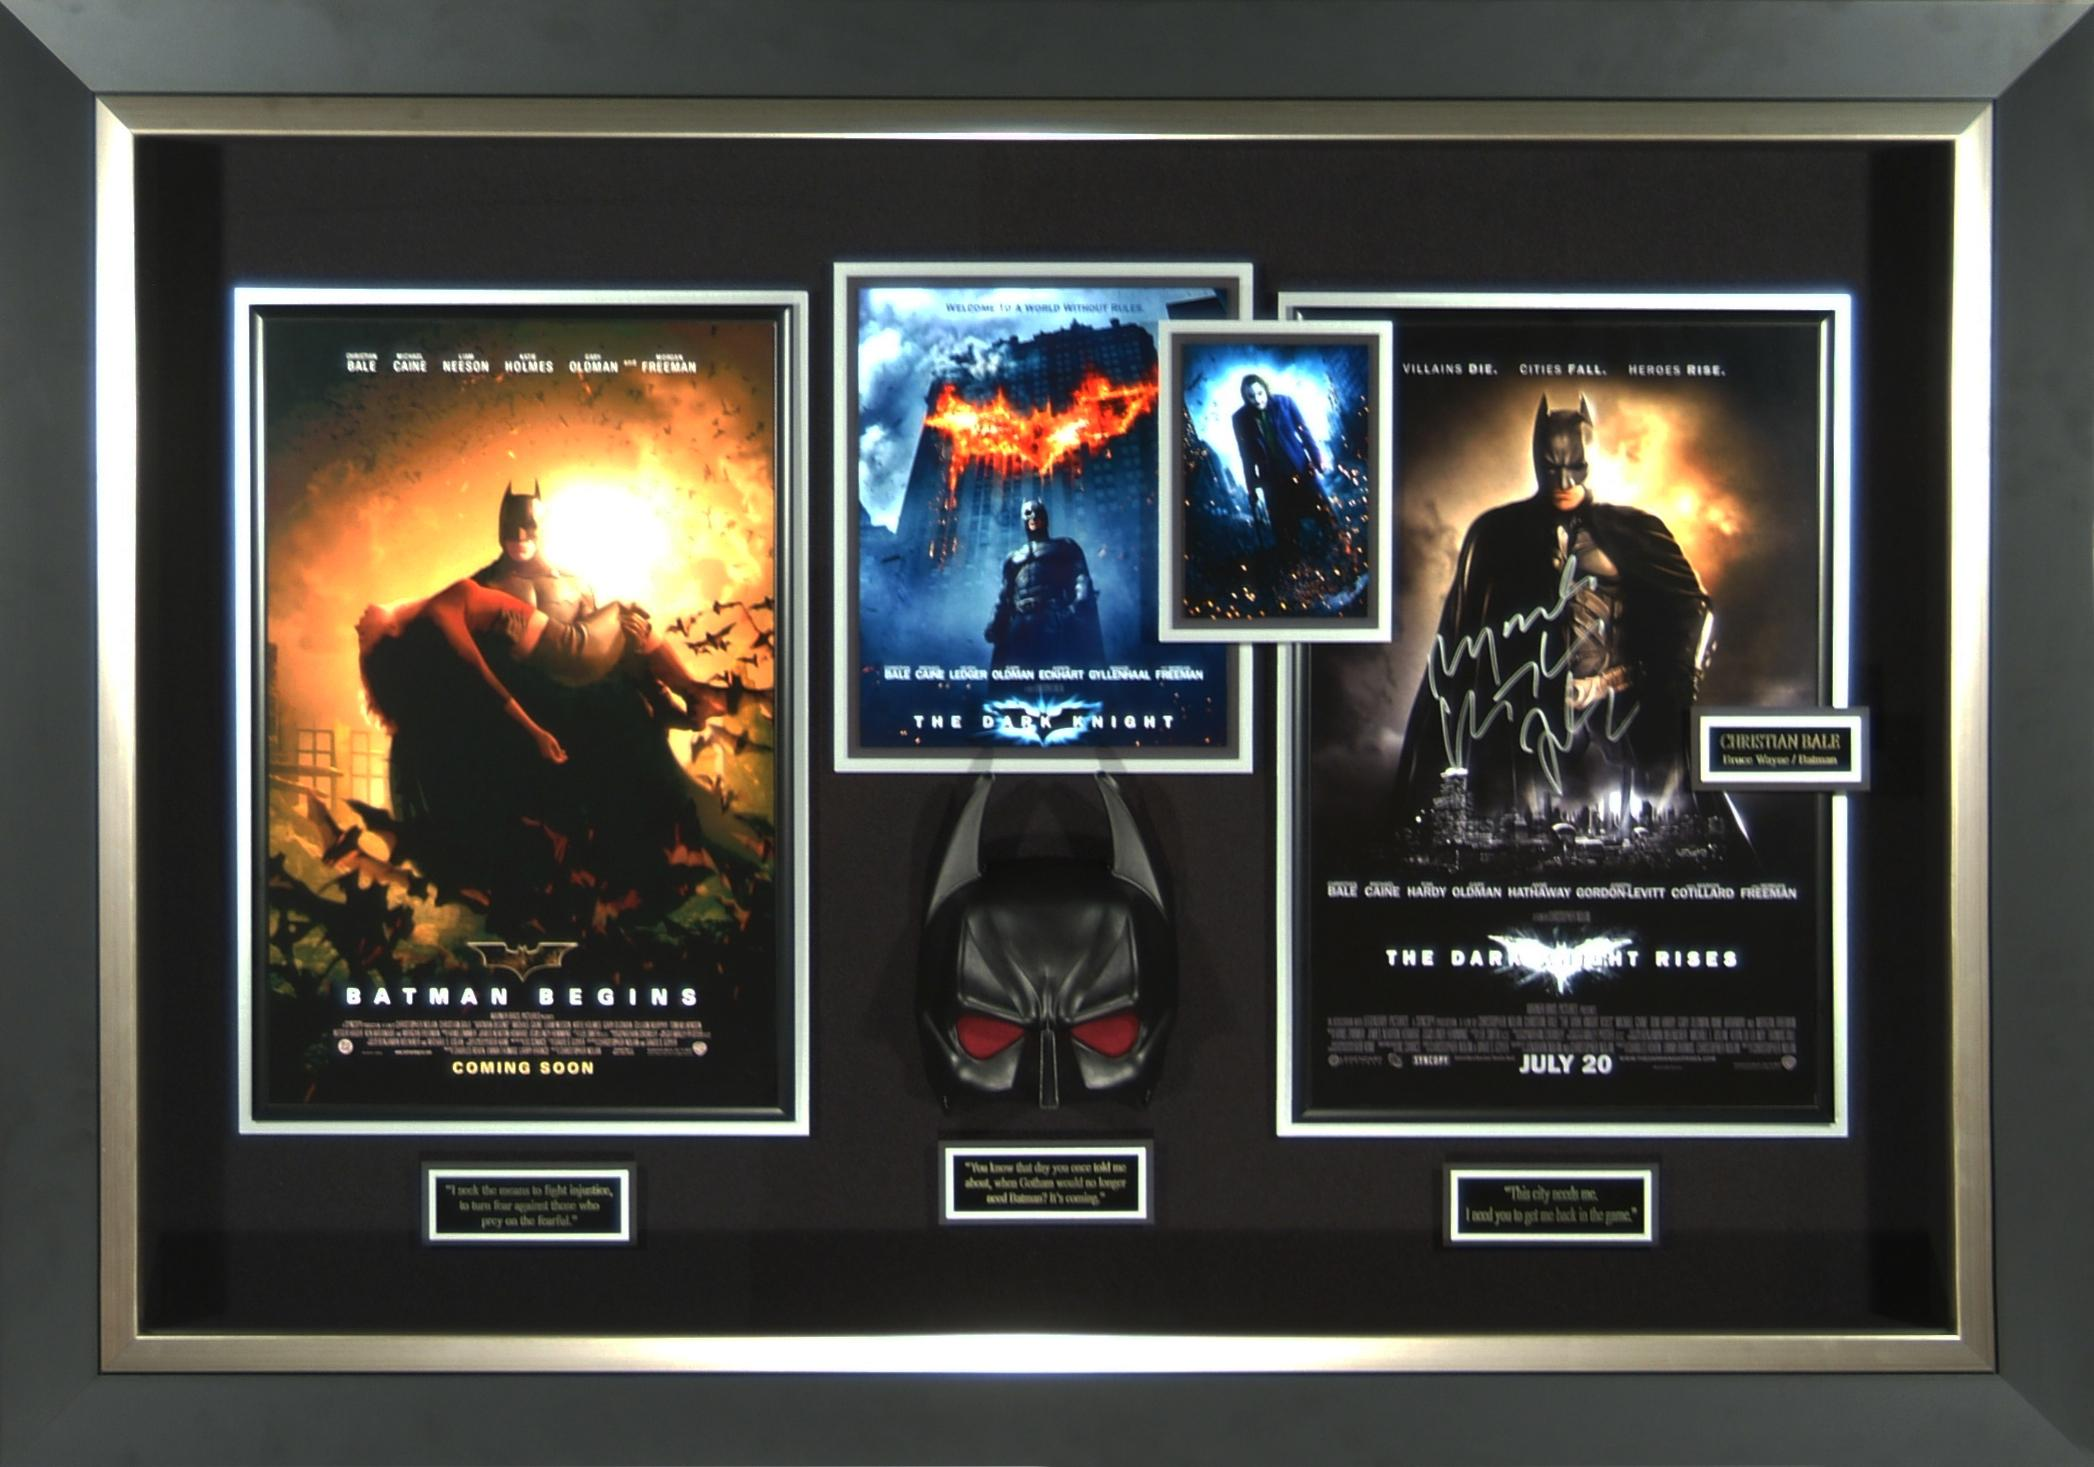 Dark Knight Trilogy Christian Bale Signed Poster Framed